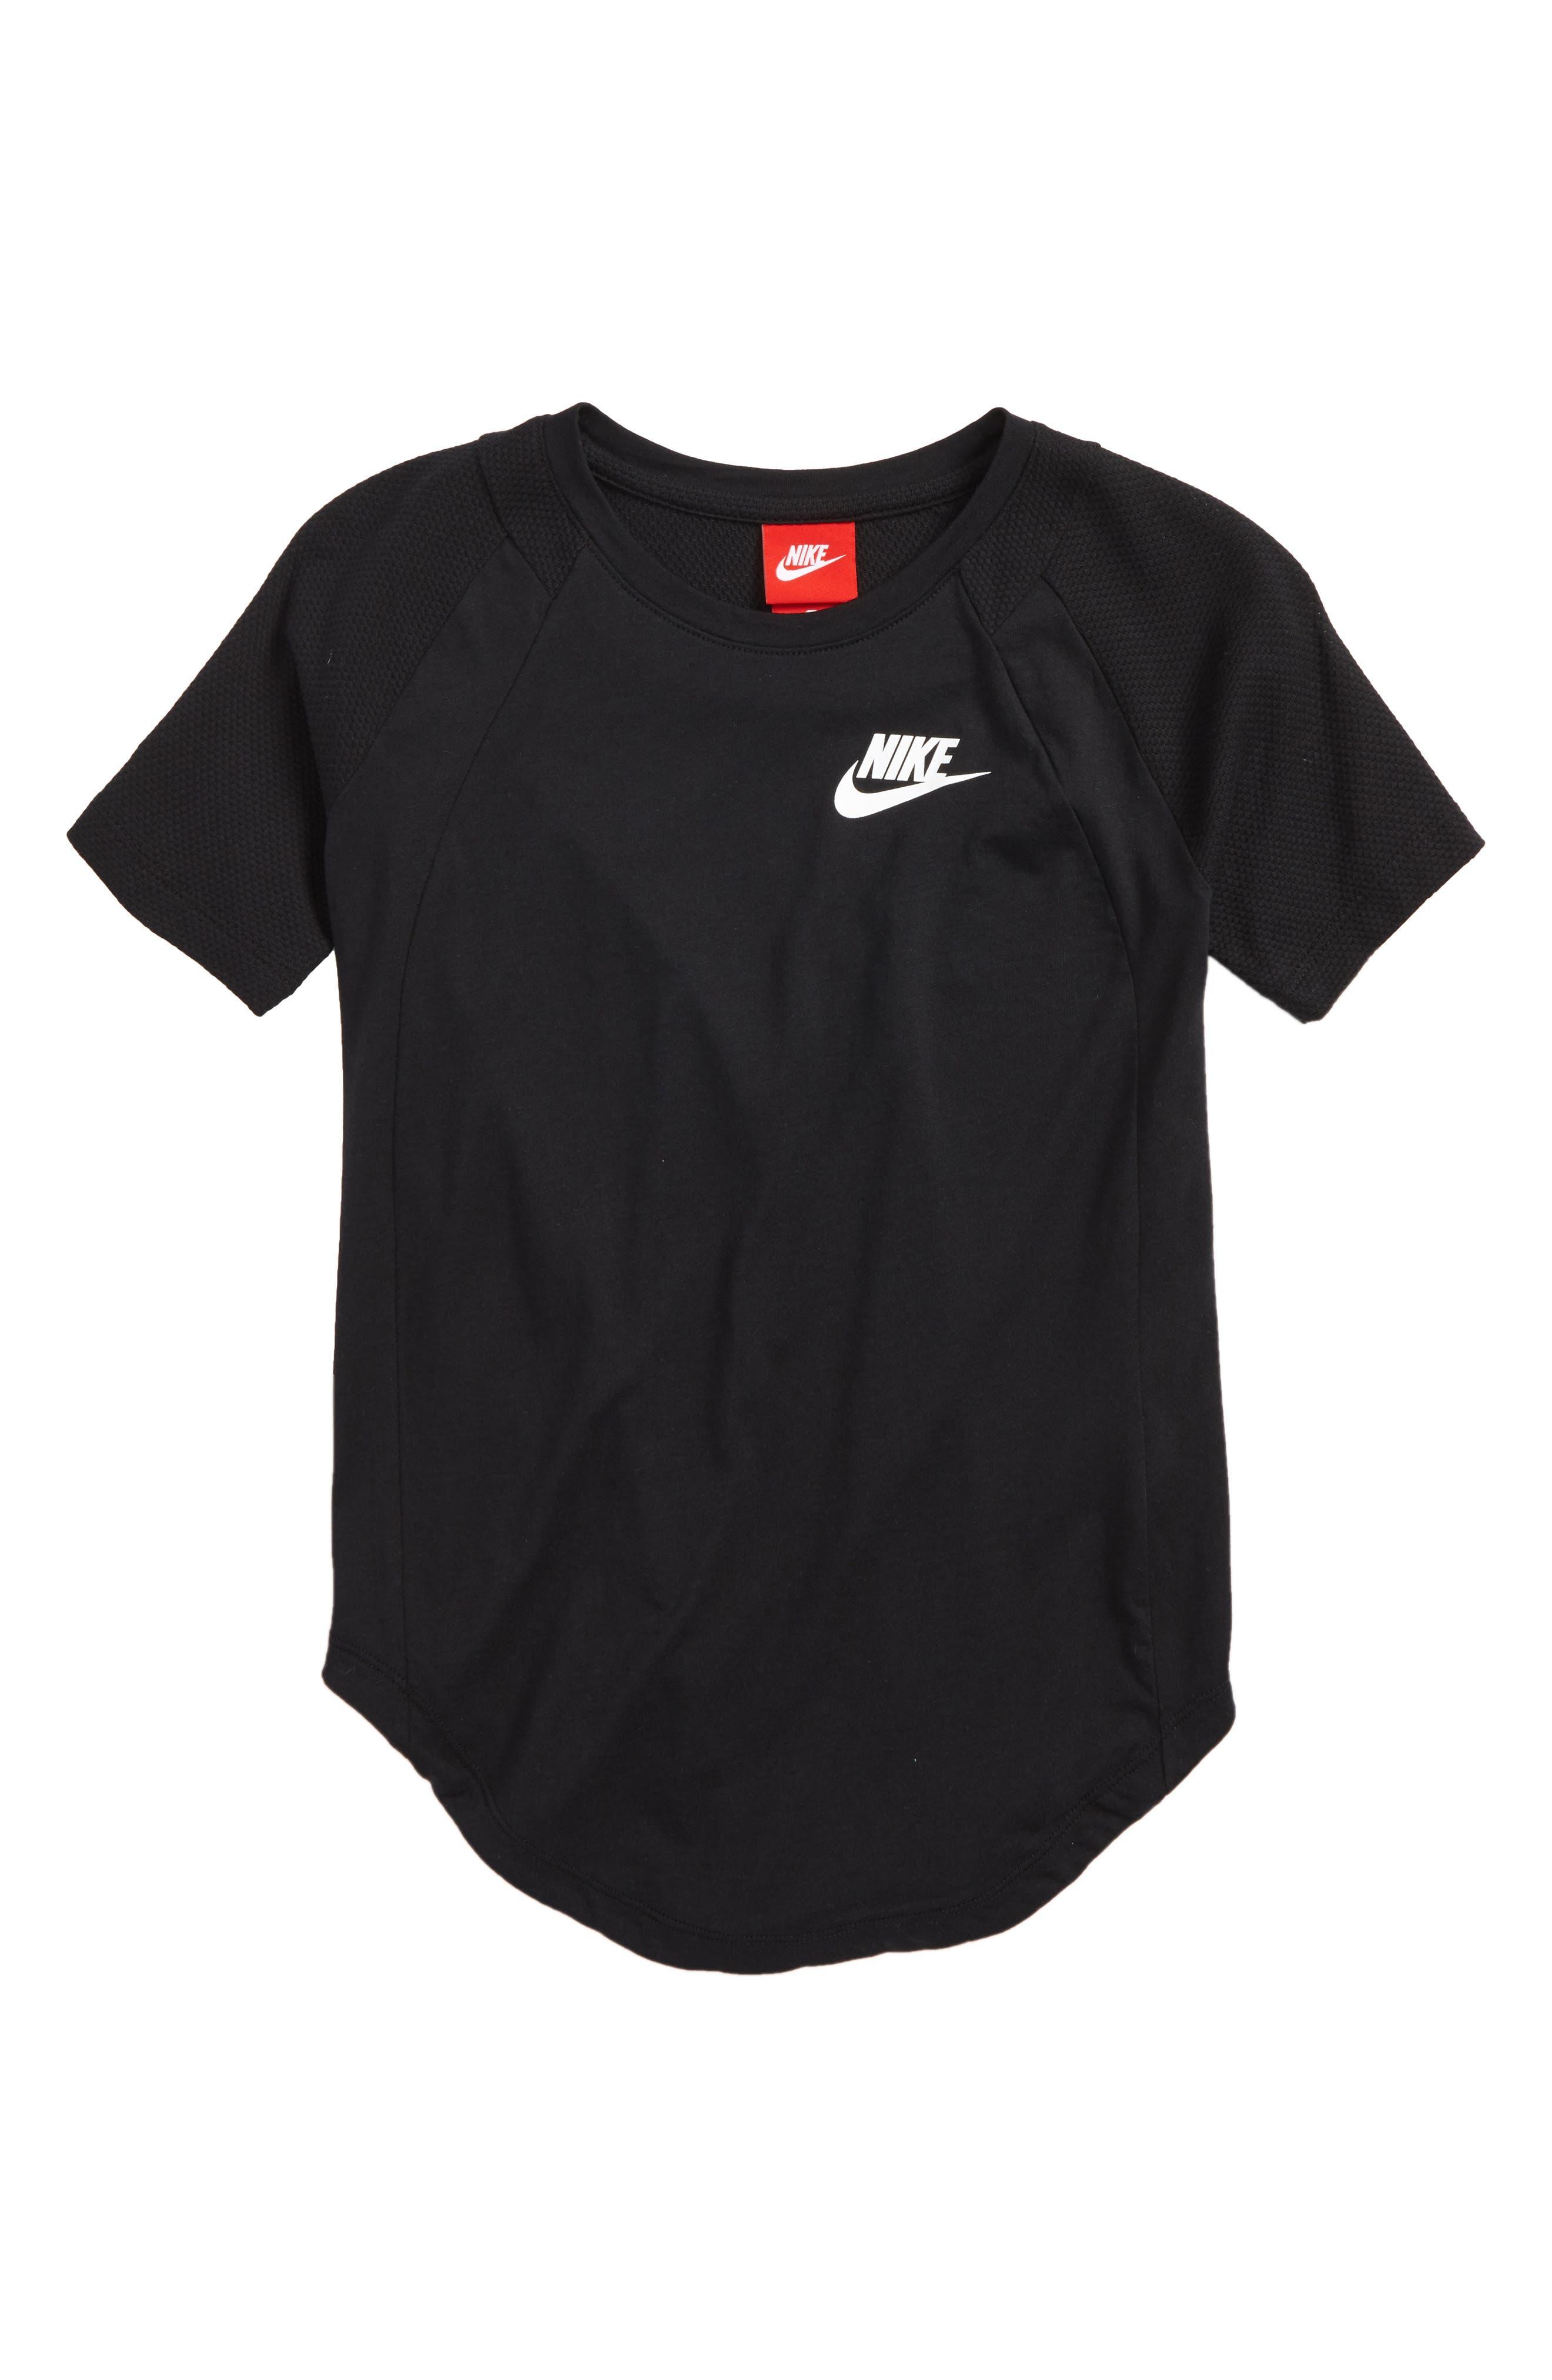 Sportswear Tee,                         Main,                         color, 010